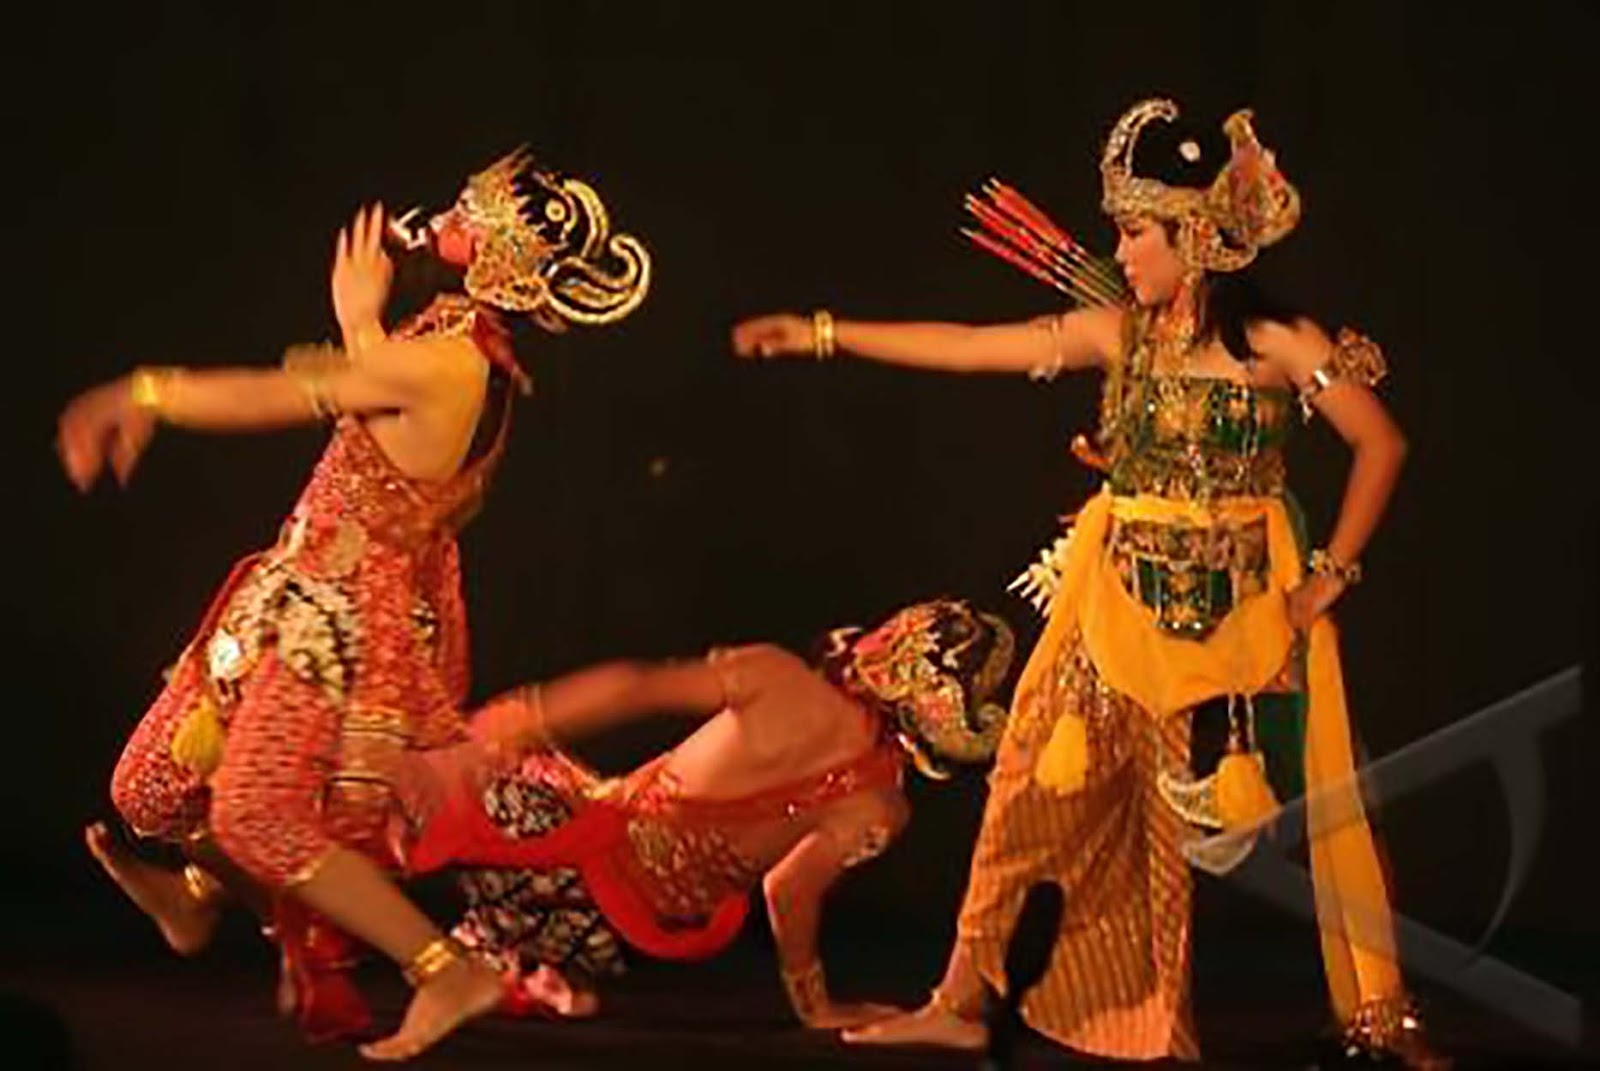 Tari Bambangan Cakil, Tarian Tradisional Dari Provinsi Jawa Tengah